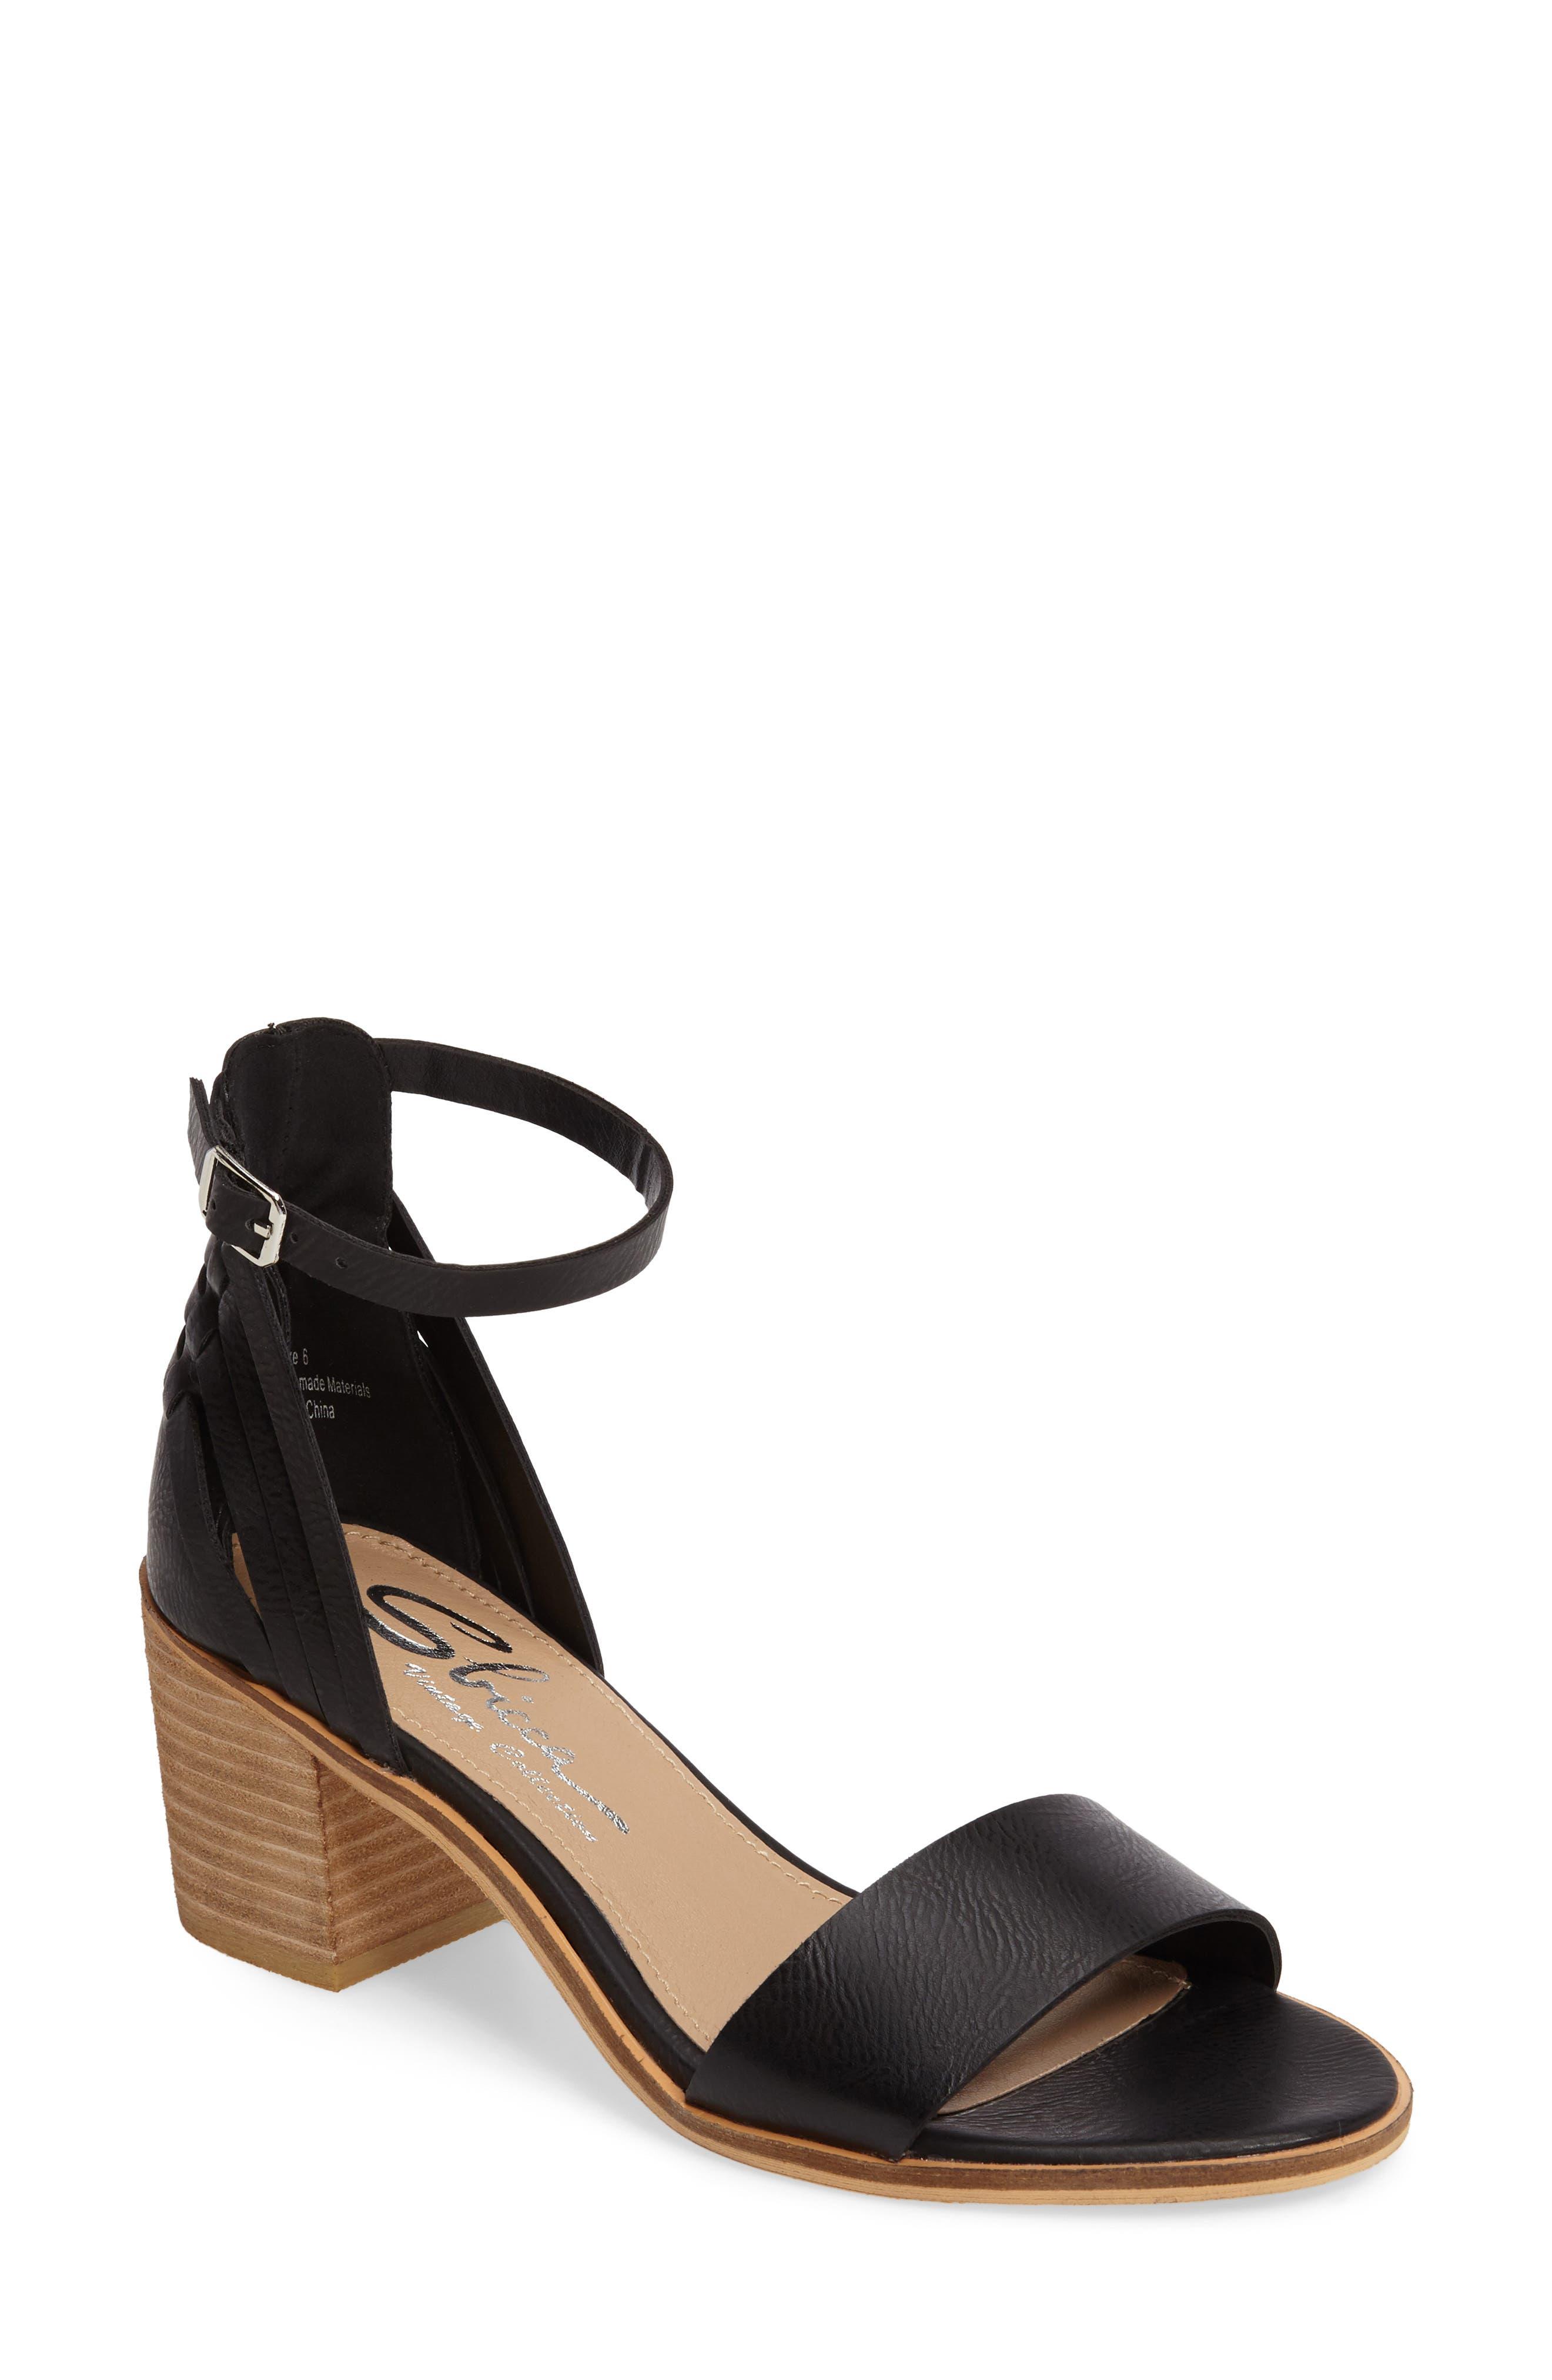 Alternate Image 1 Selected - Sbicca Fars Block Heel Sandal (Women)